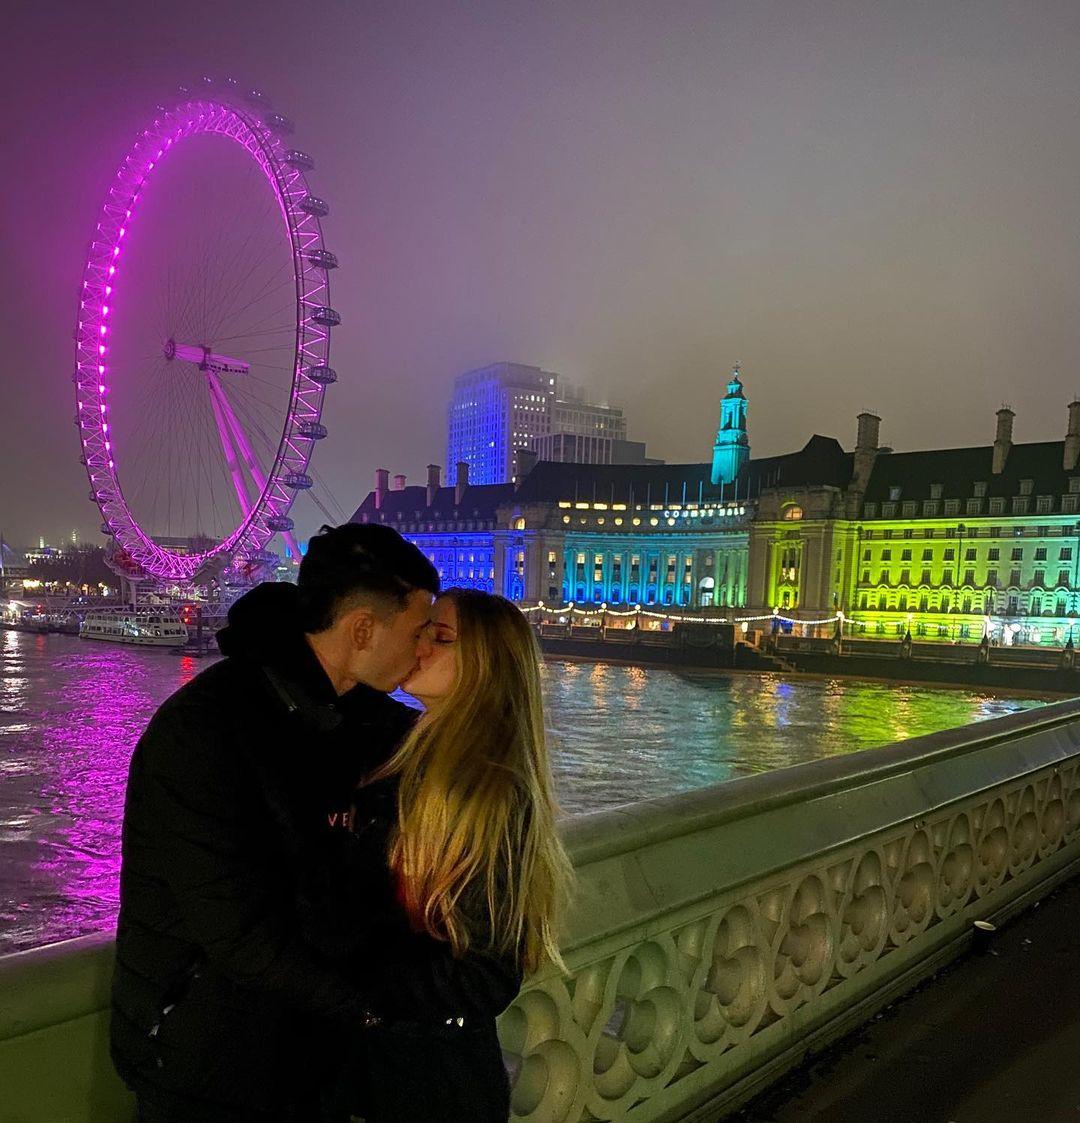 Gabriel Martinelli with his new girlfriend